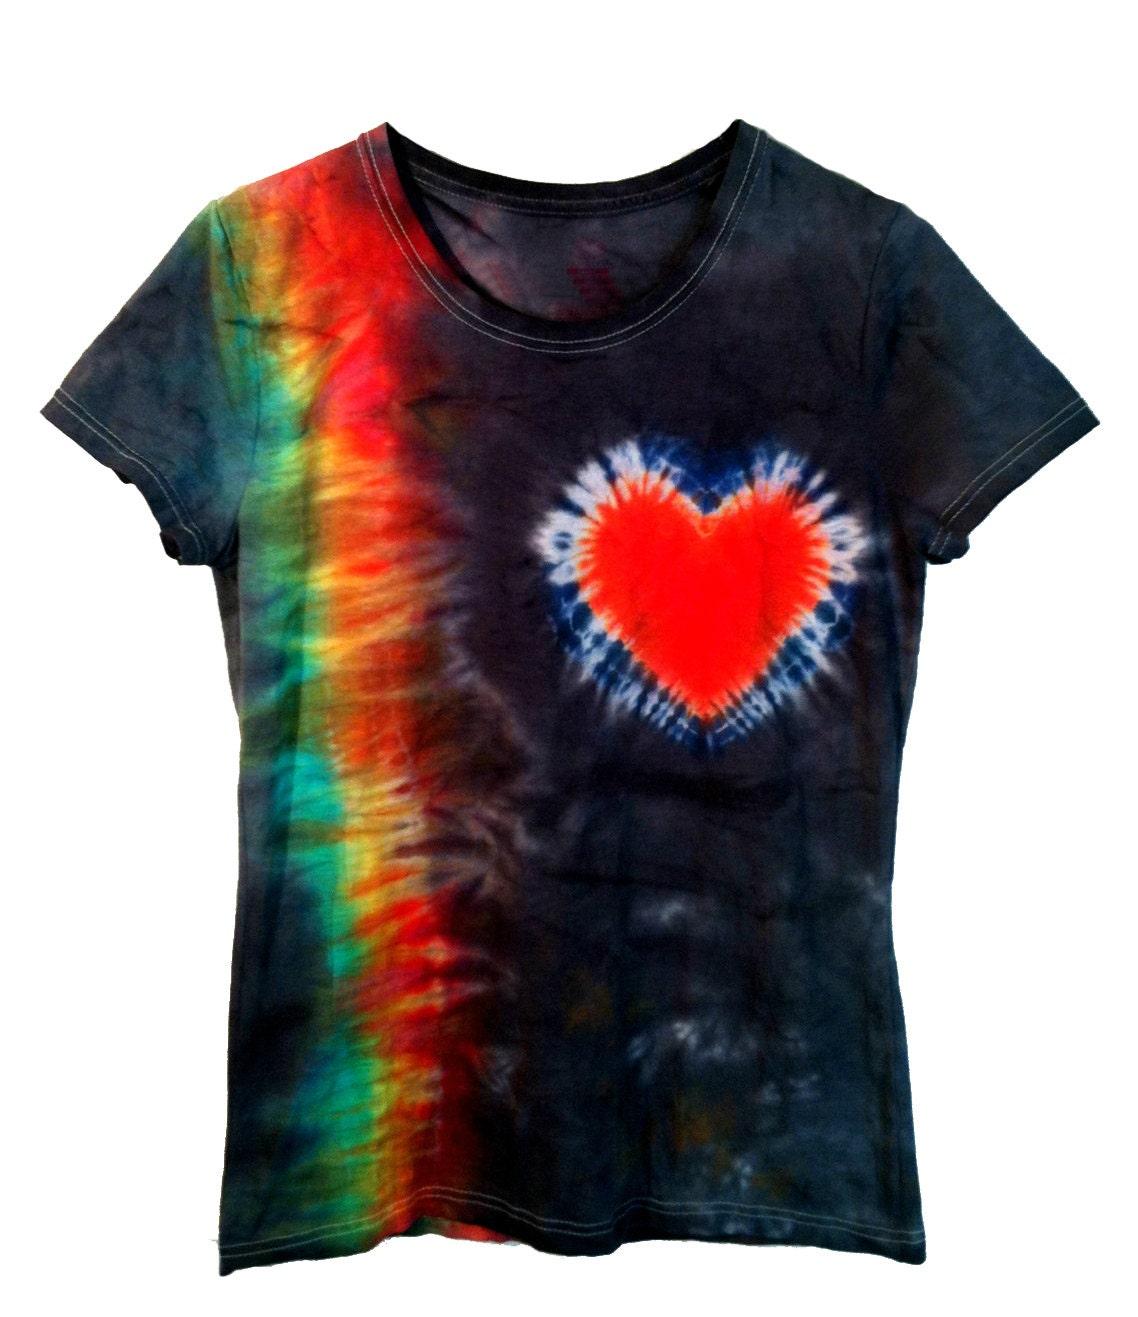 Tie-Dye Supplies Information - Dharma Trading Co Tie dye fashion shirts